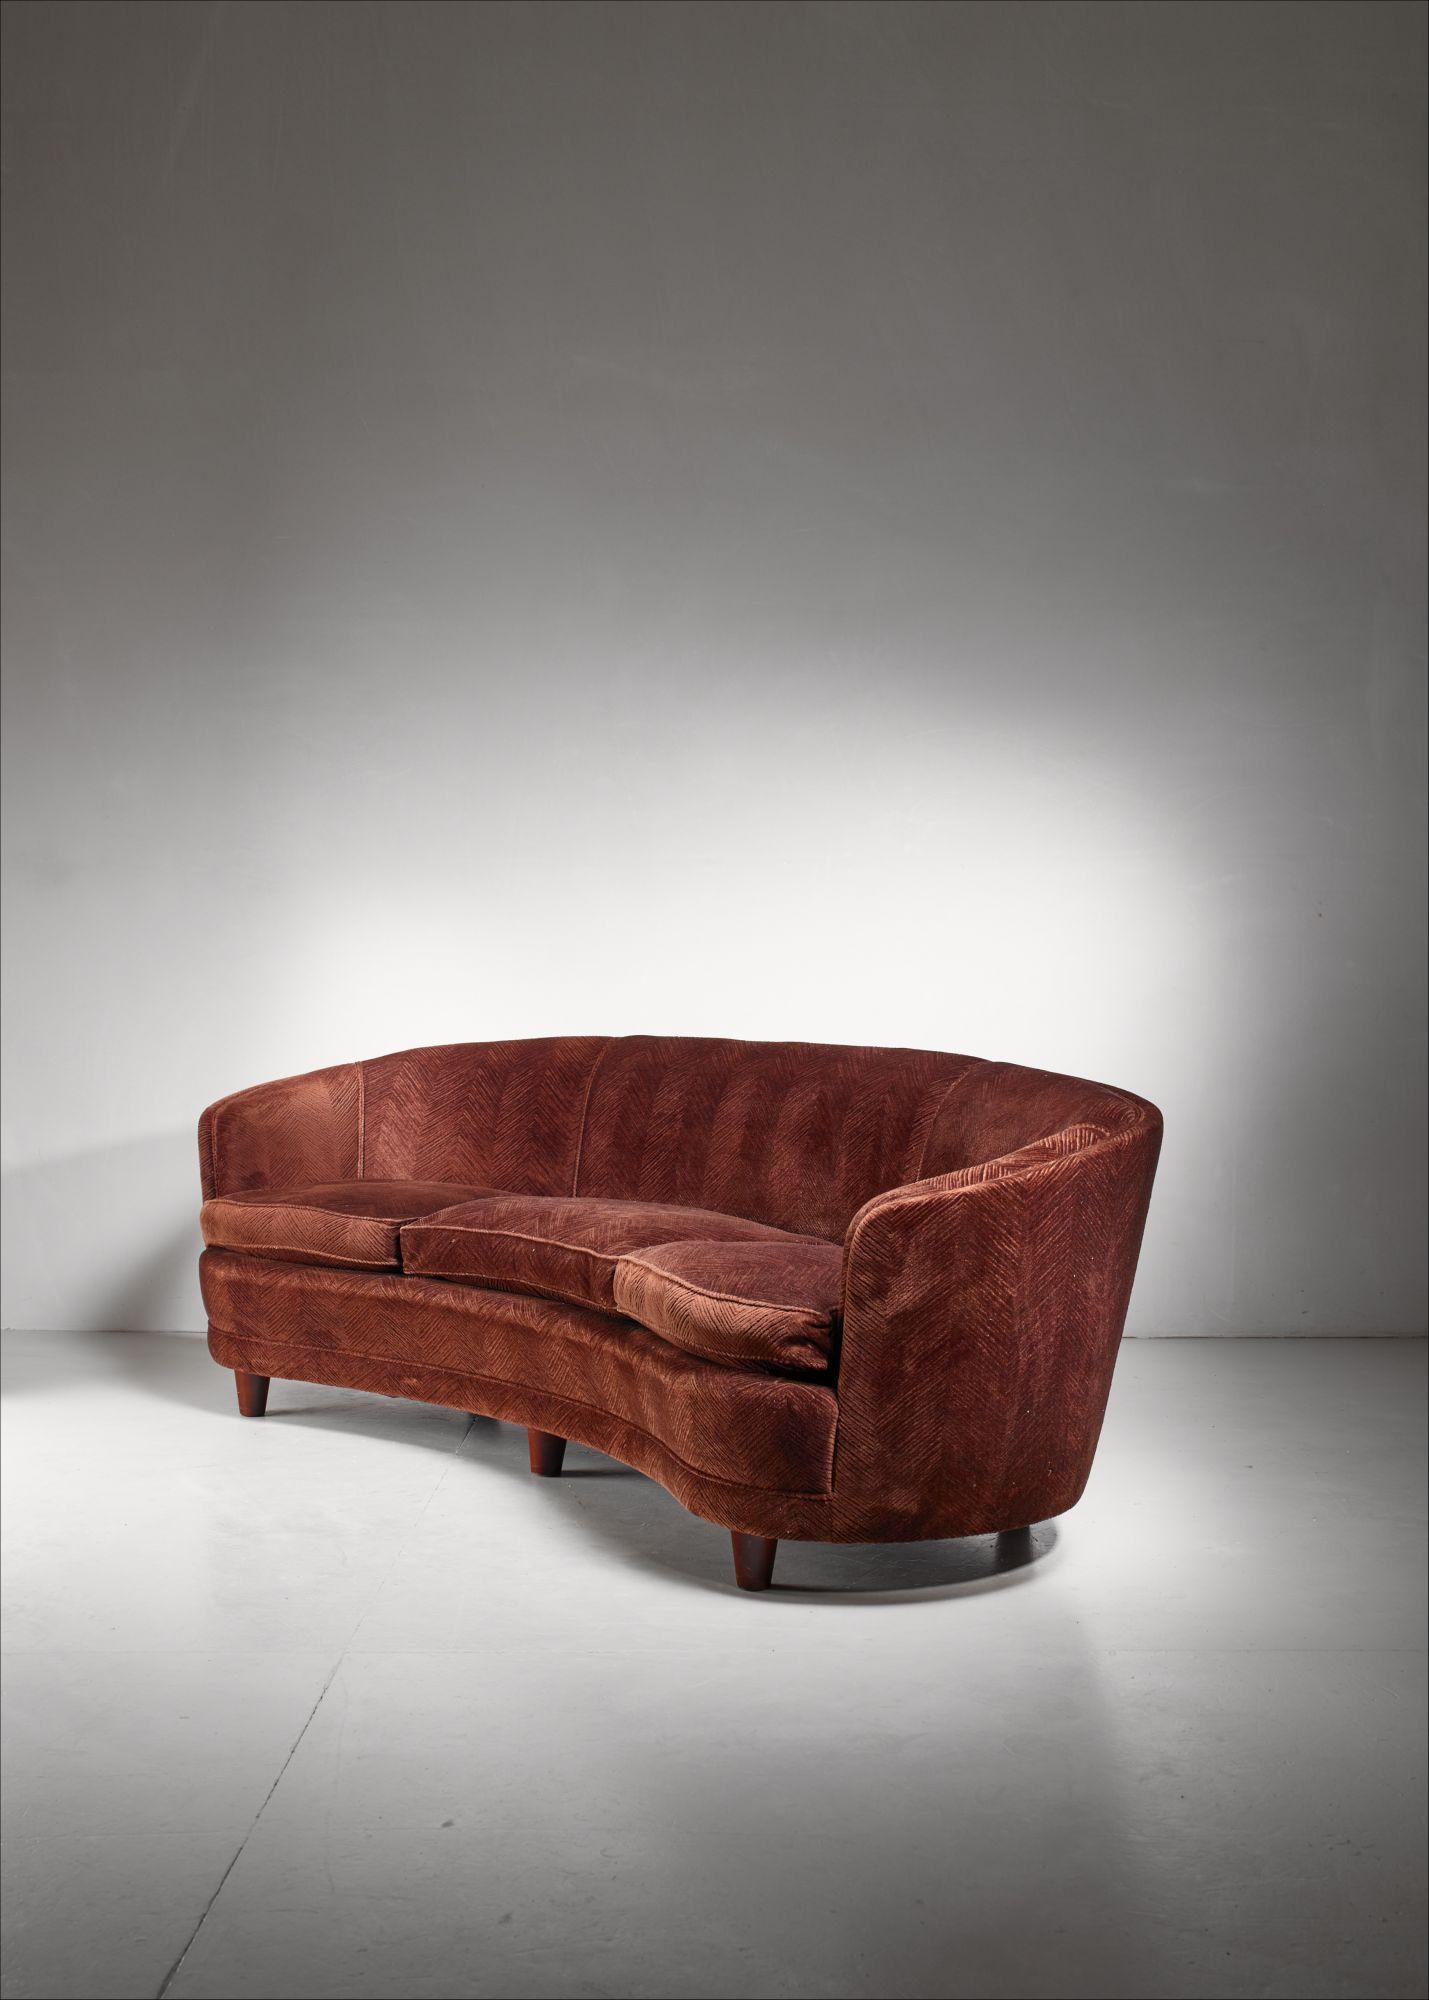 Large curved, brown Scandinavian sofa, 1940s